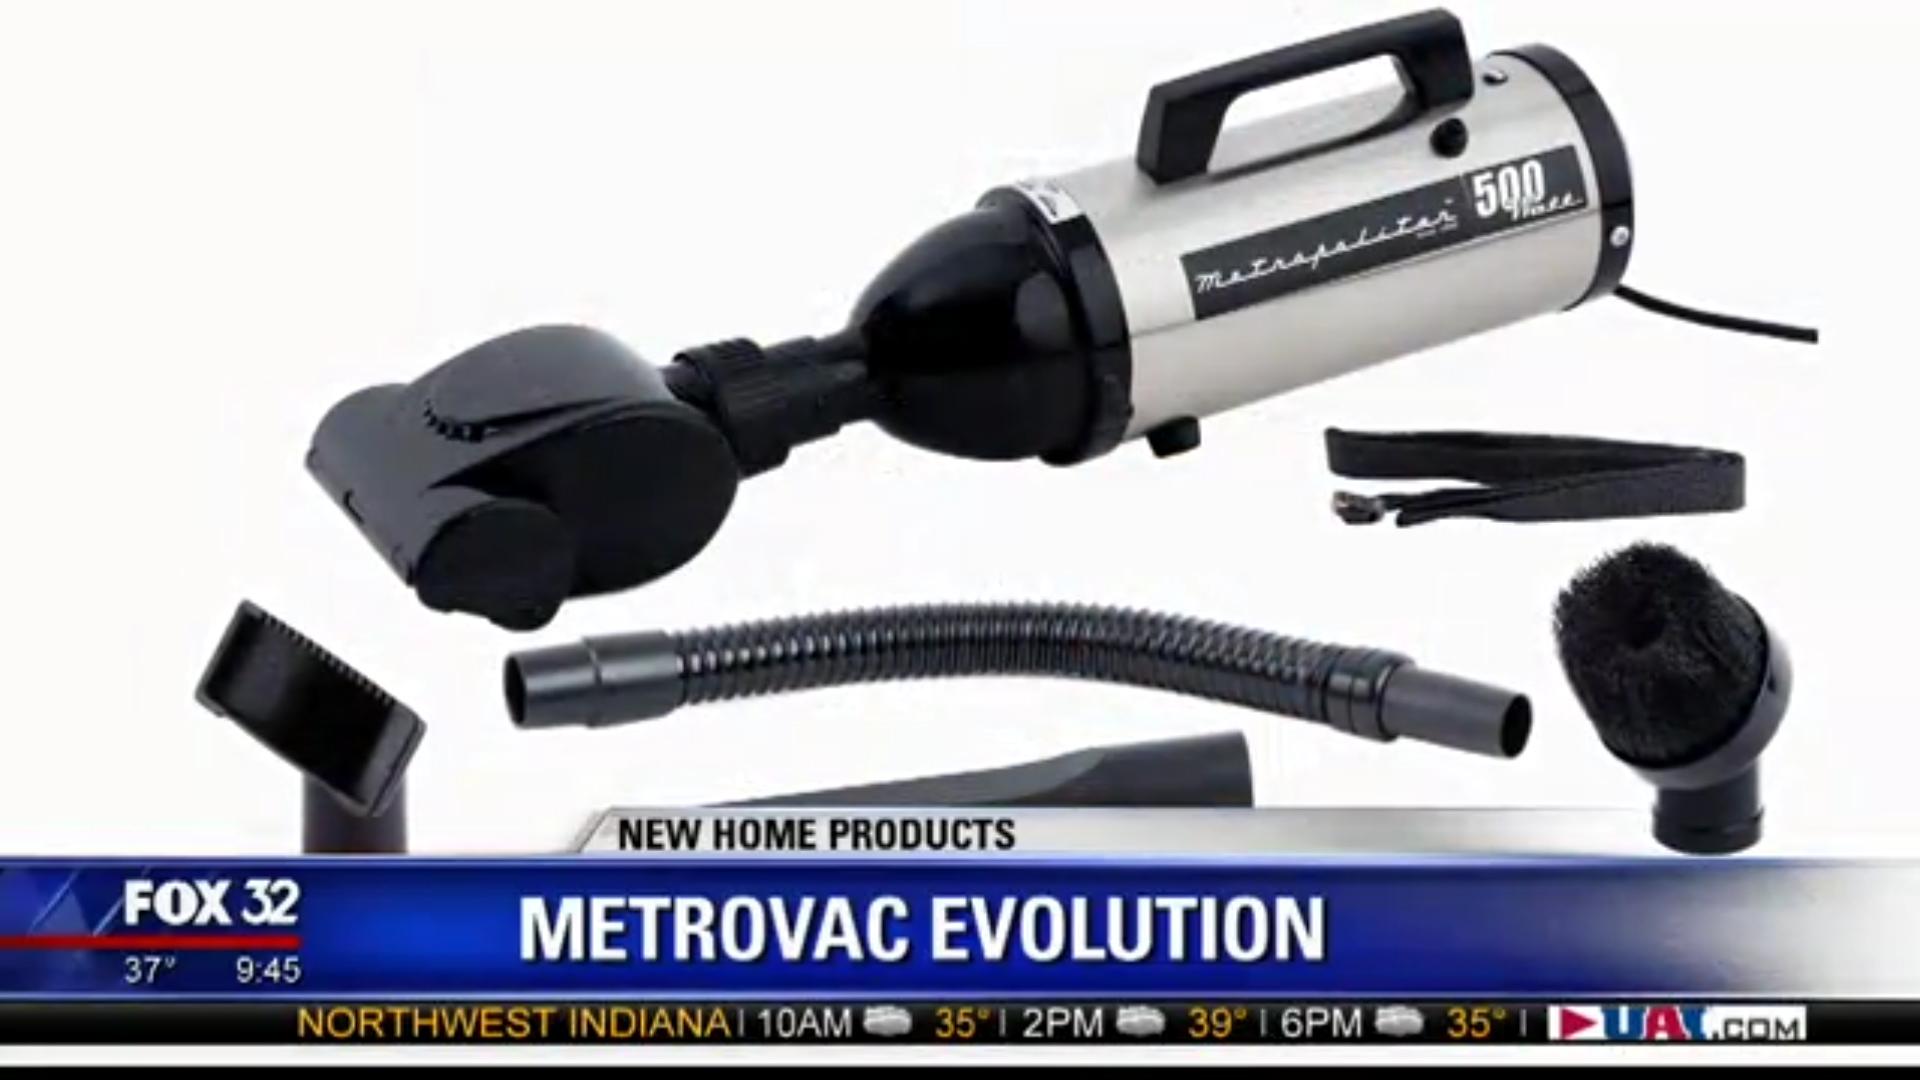 METROVAC EVOLUTION 500 WATT VAC - $131.99Shop Now